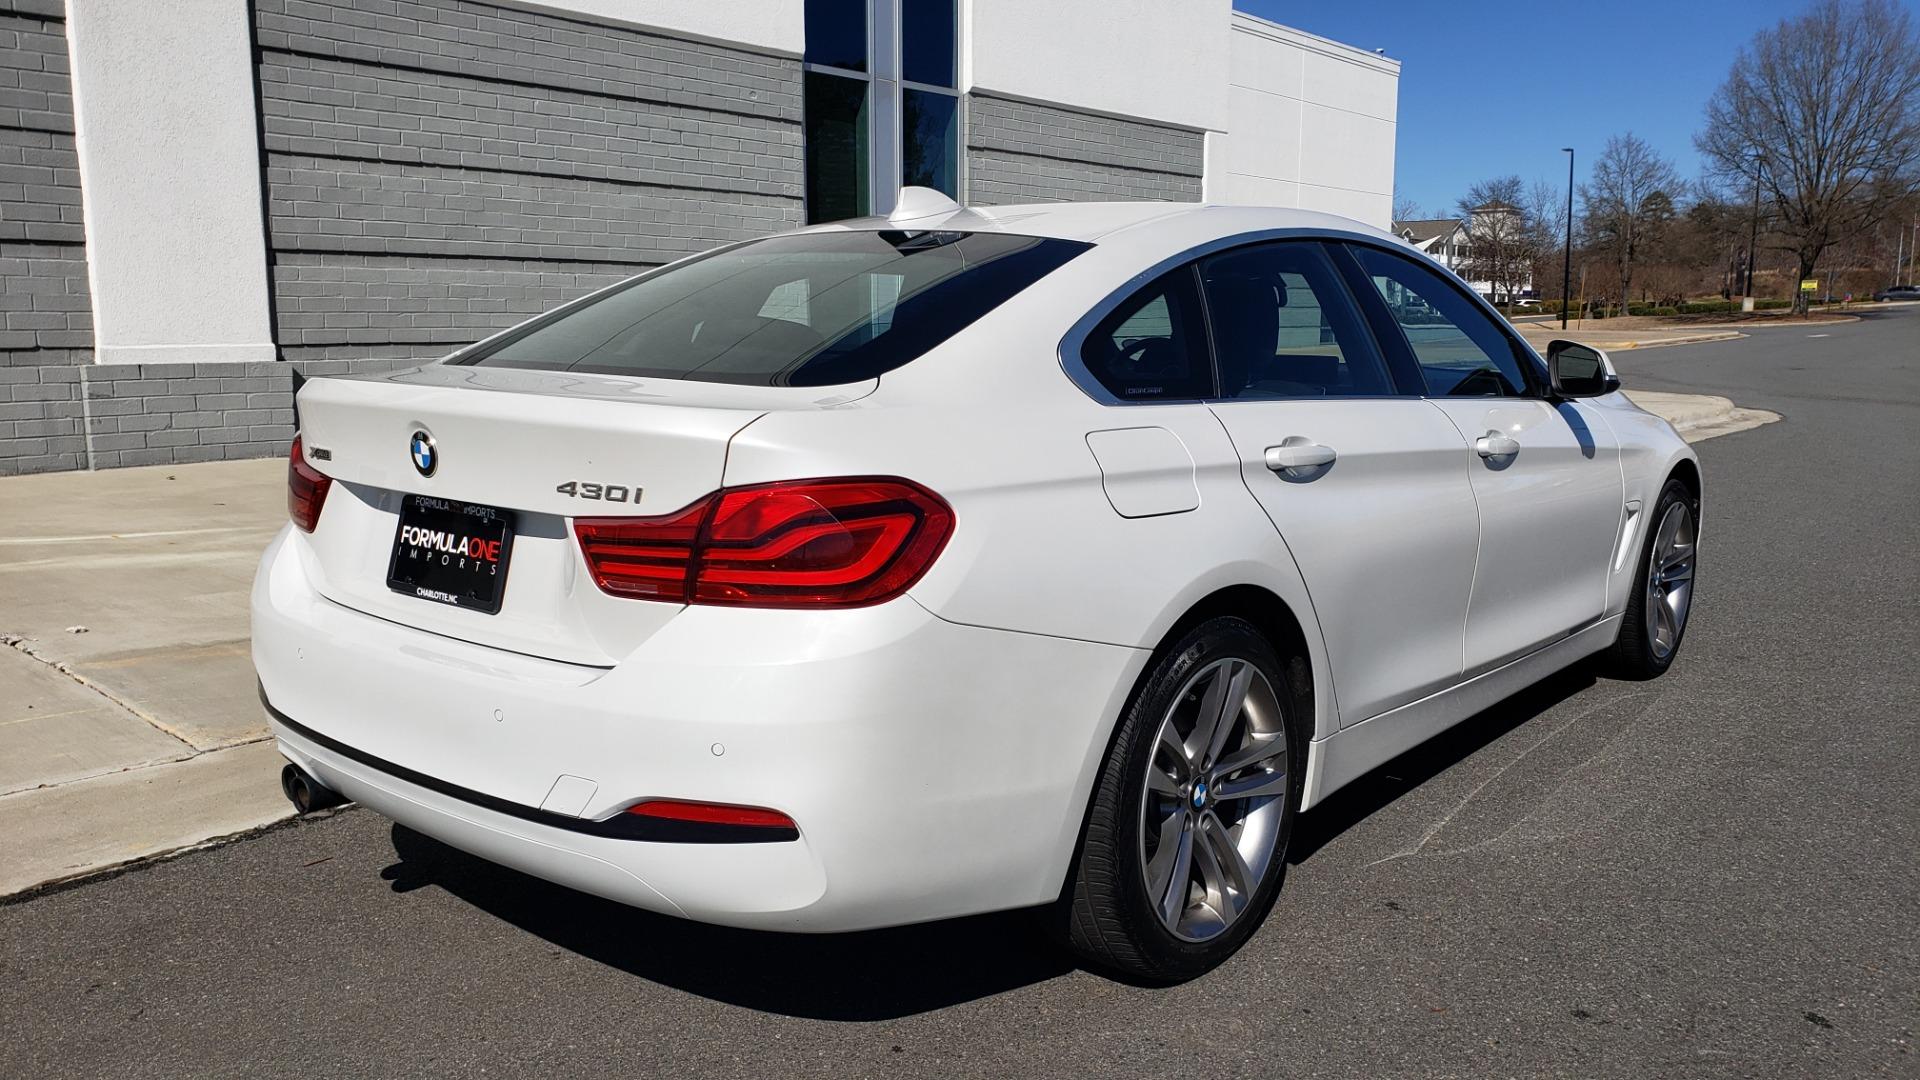 Used 2018 BMW 4 SERIES 430IXDRIVE / PREMIUM / NAV / SUNROOF / ESSENTIALS PKG for sale $27,795 at Formula Imports in Charlotte NC 28227 7